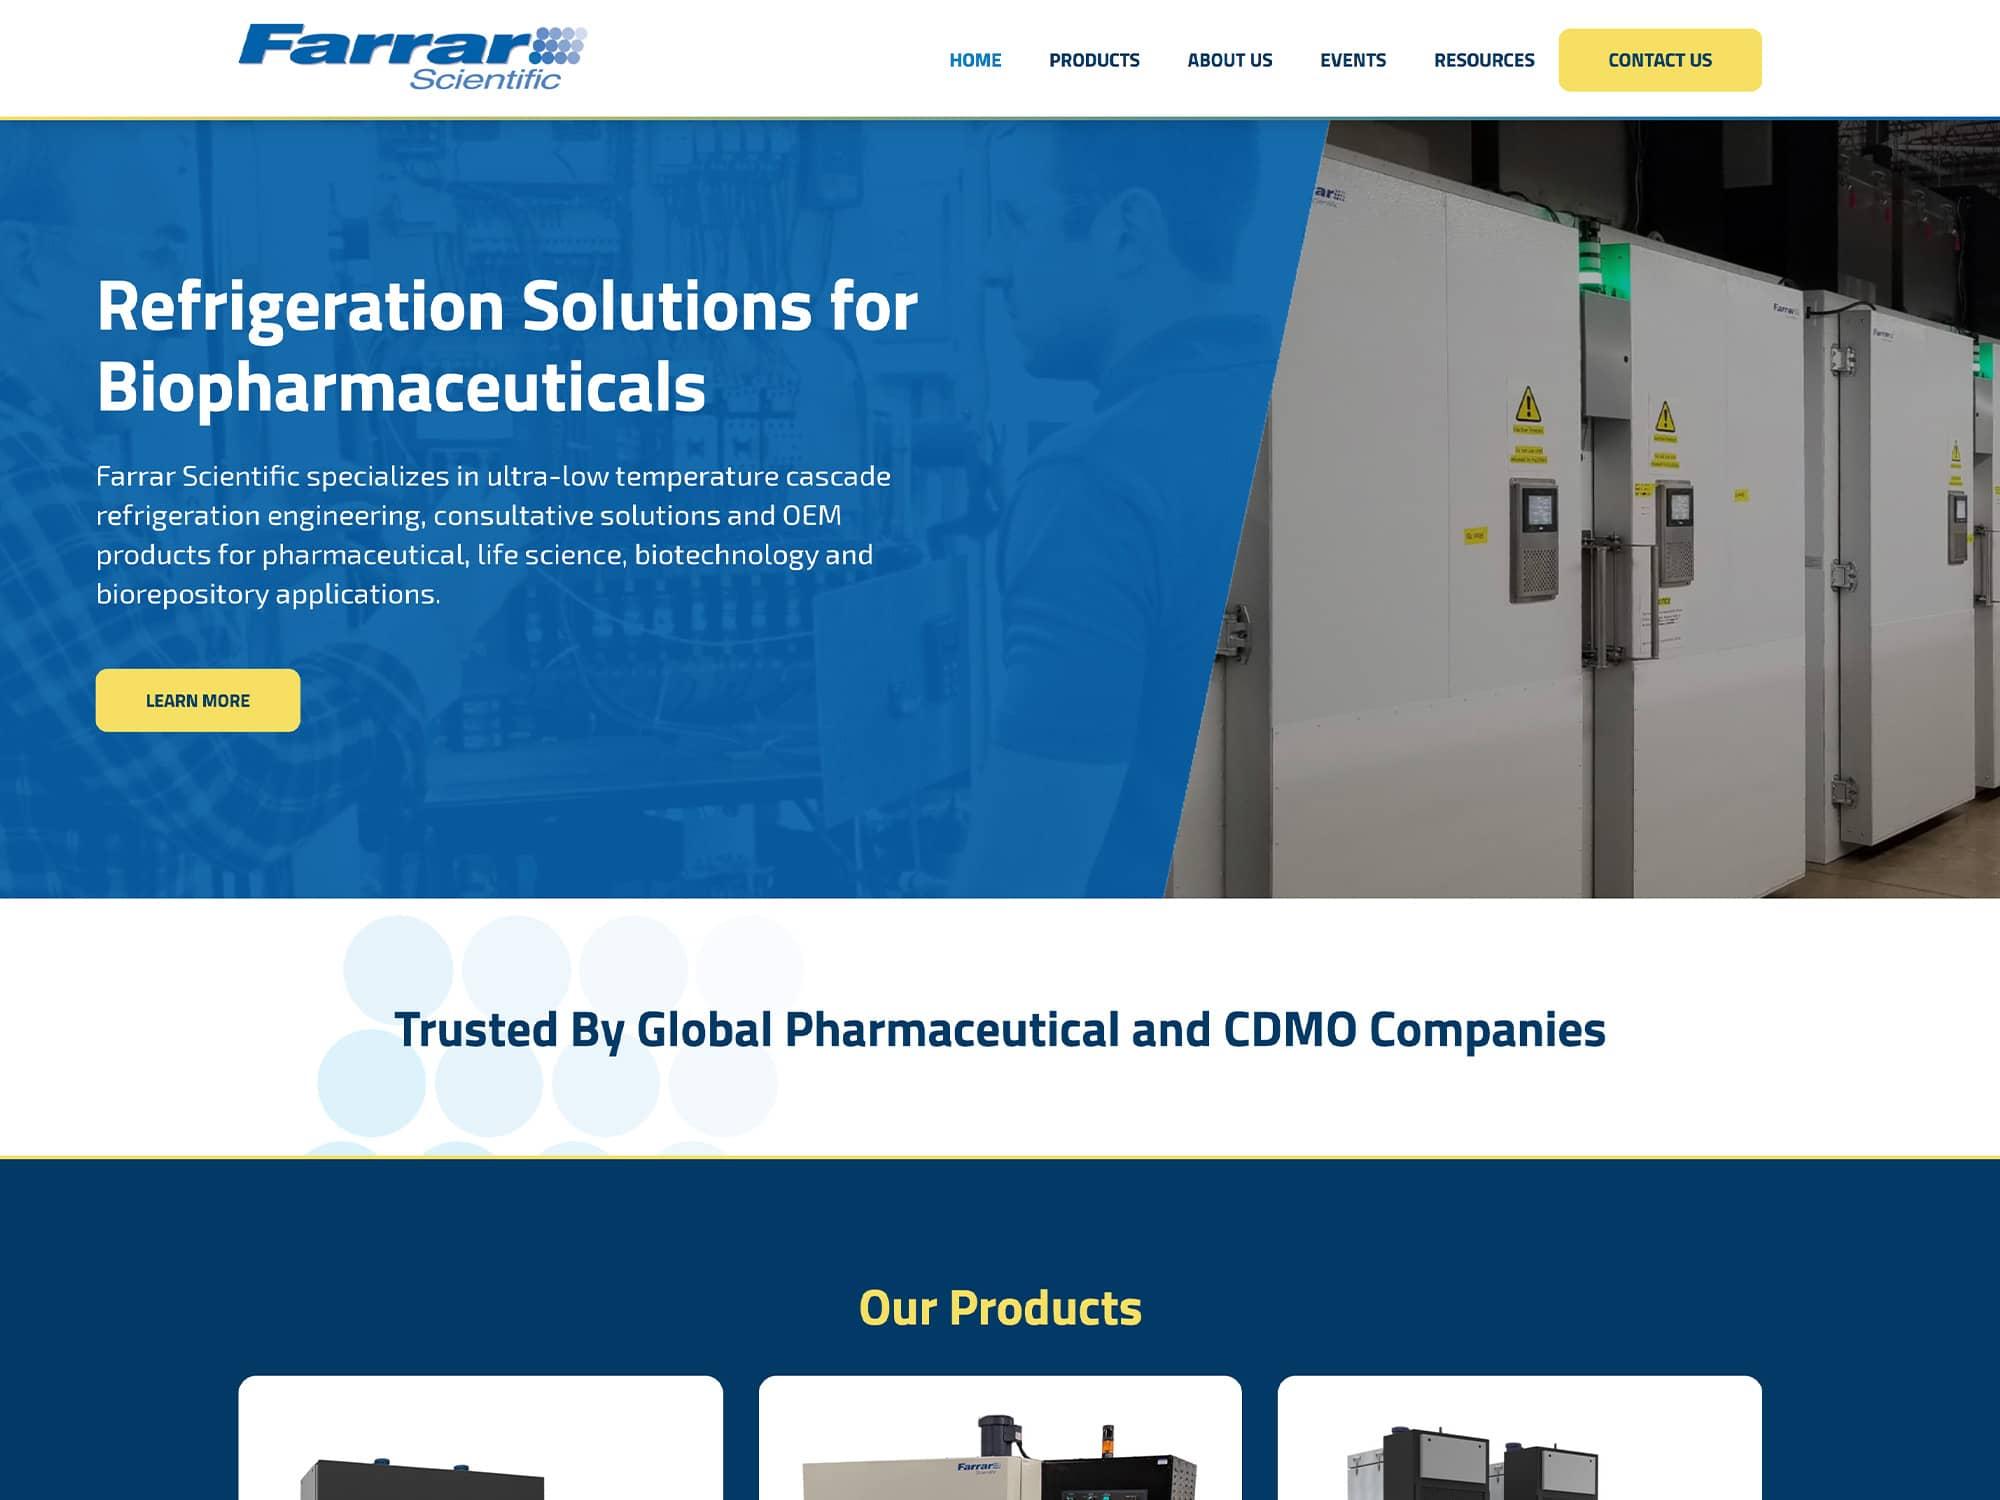 Farrar Scientific New Website Home Page